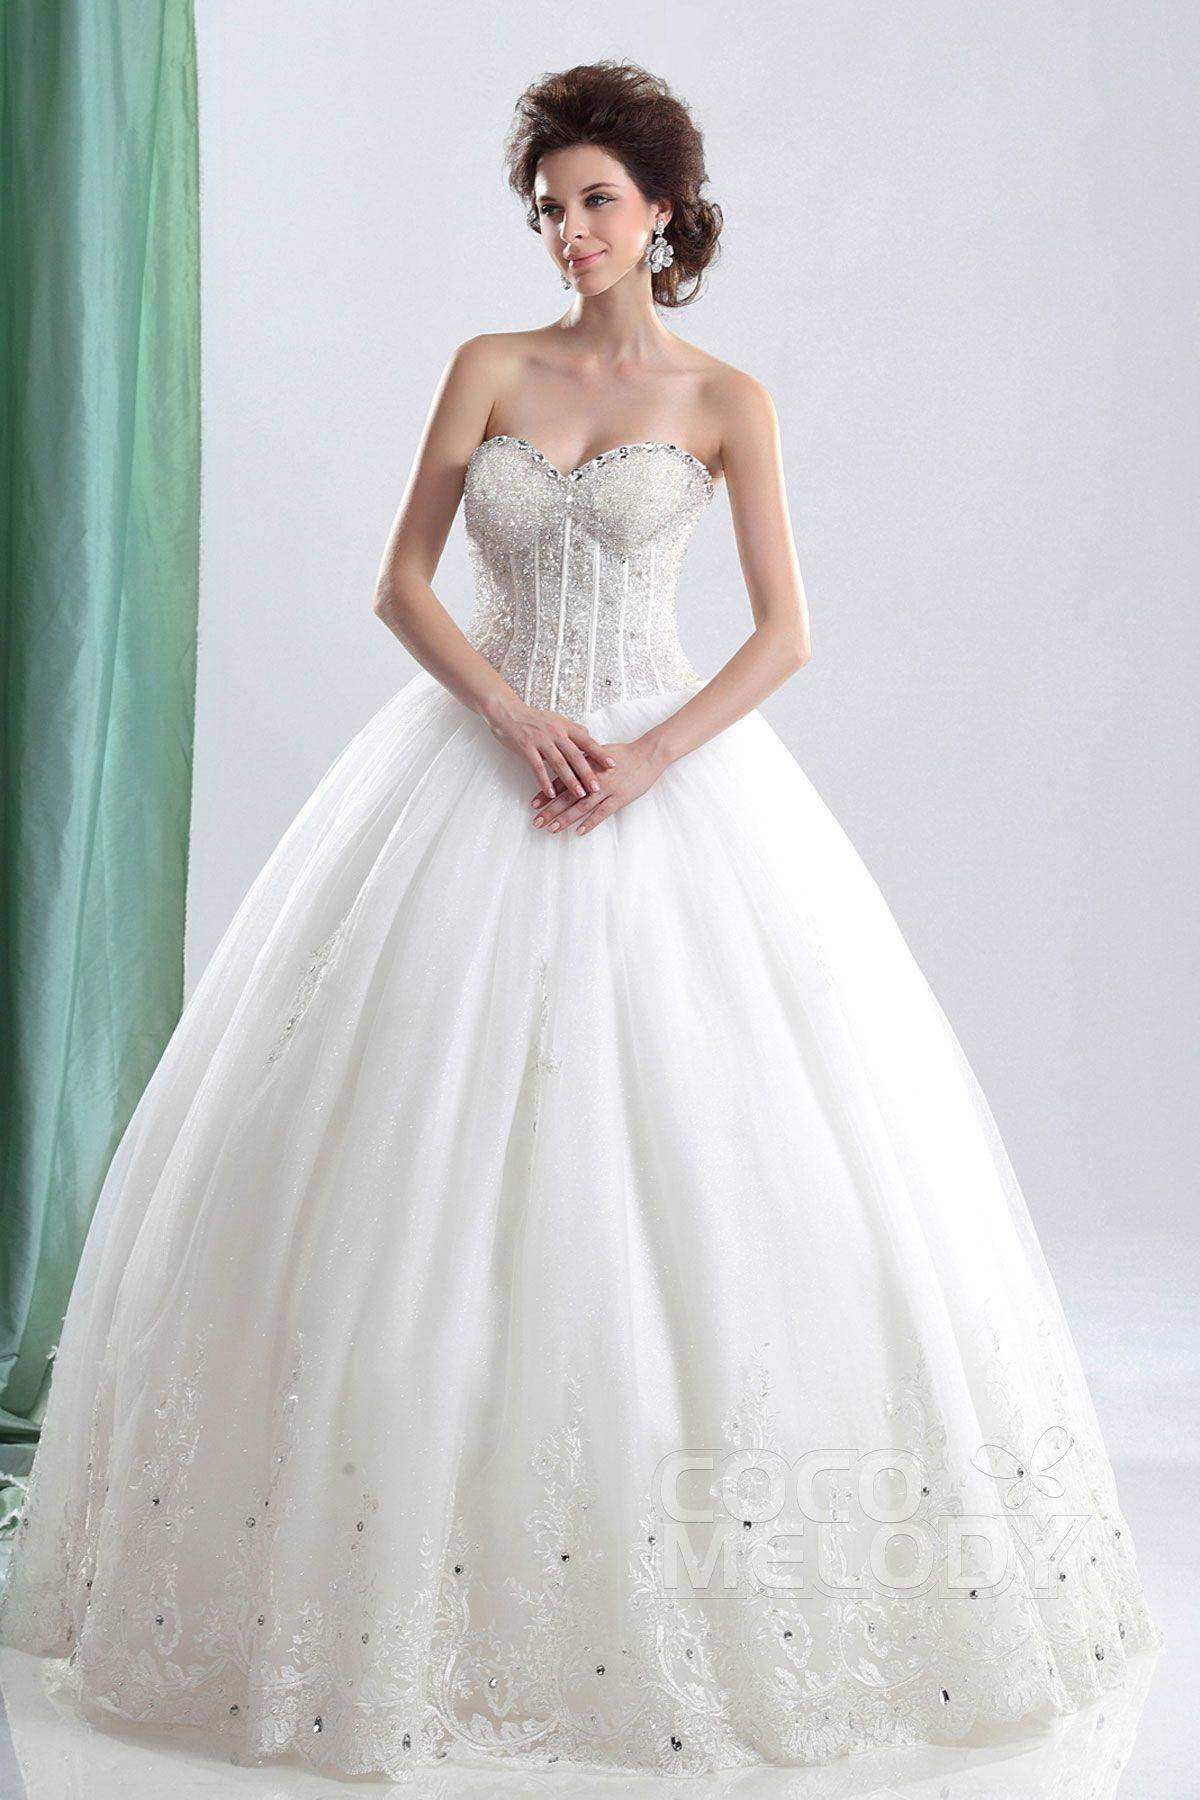 Wedding dresses ball gown sweetheart  Dreamy Ball Gown Sweetheart Basque Waist Floor Length Tulle Wedding